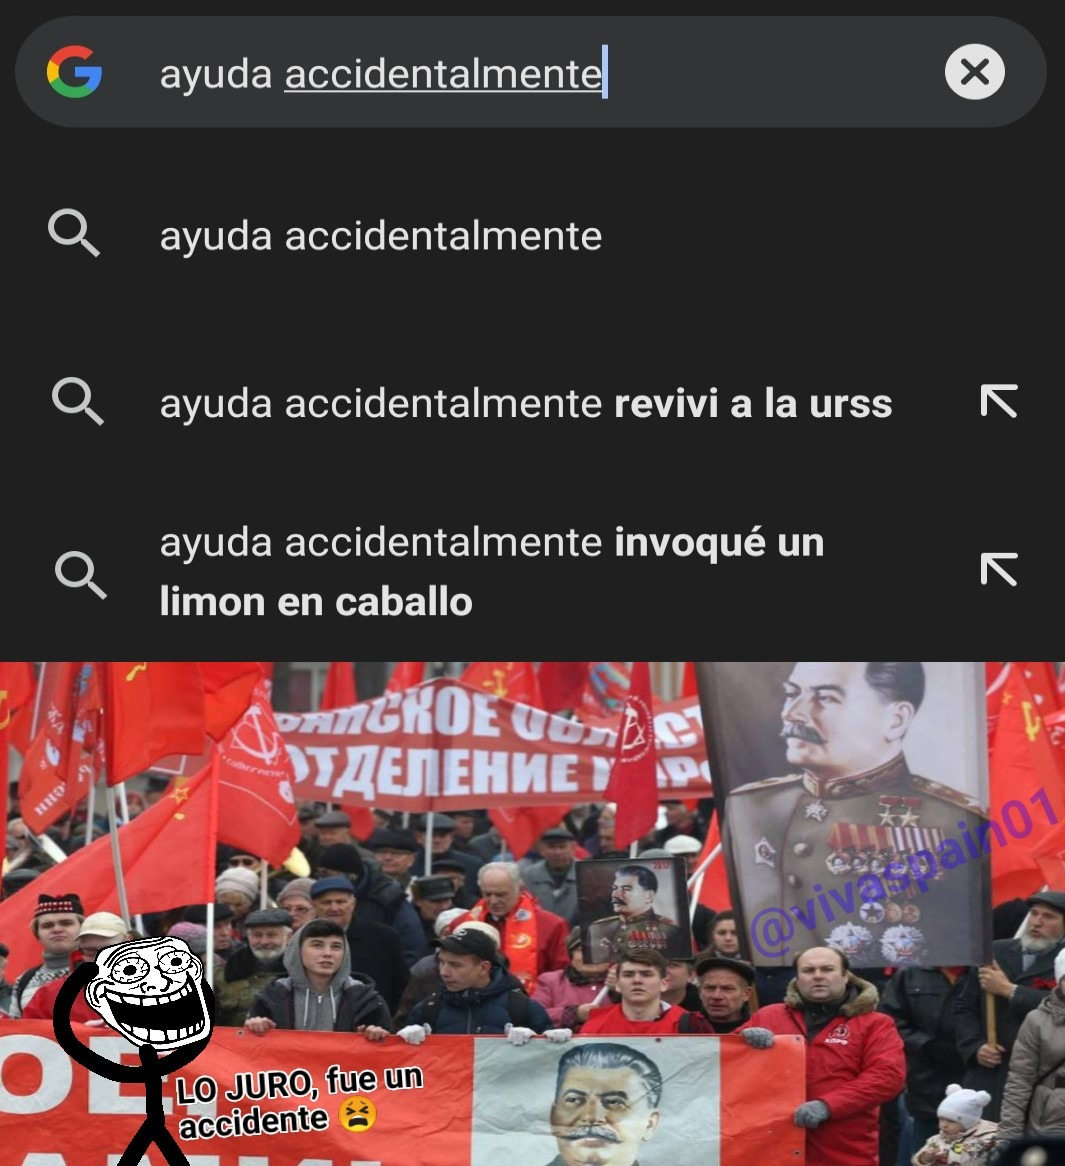 Ayuda accidentalmente reviví la URSS  - meme